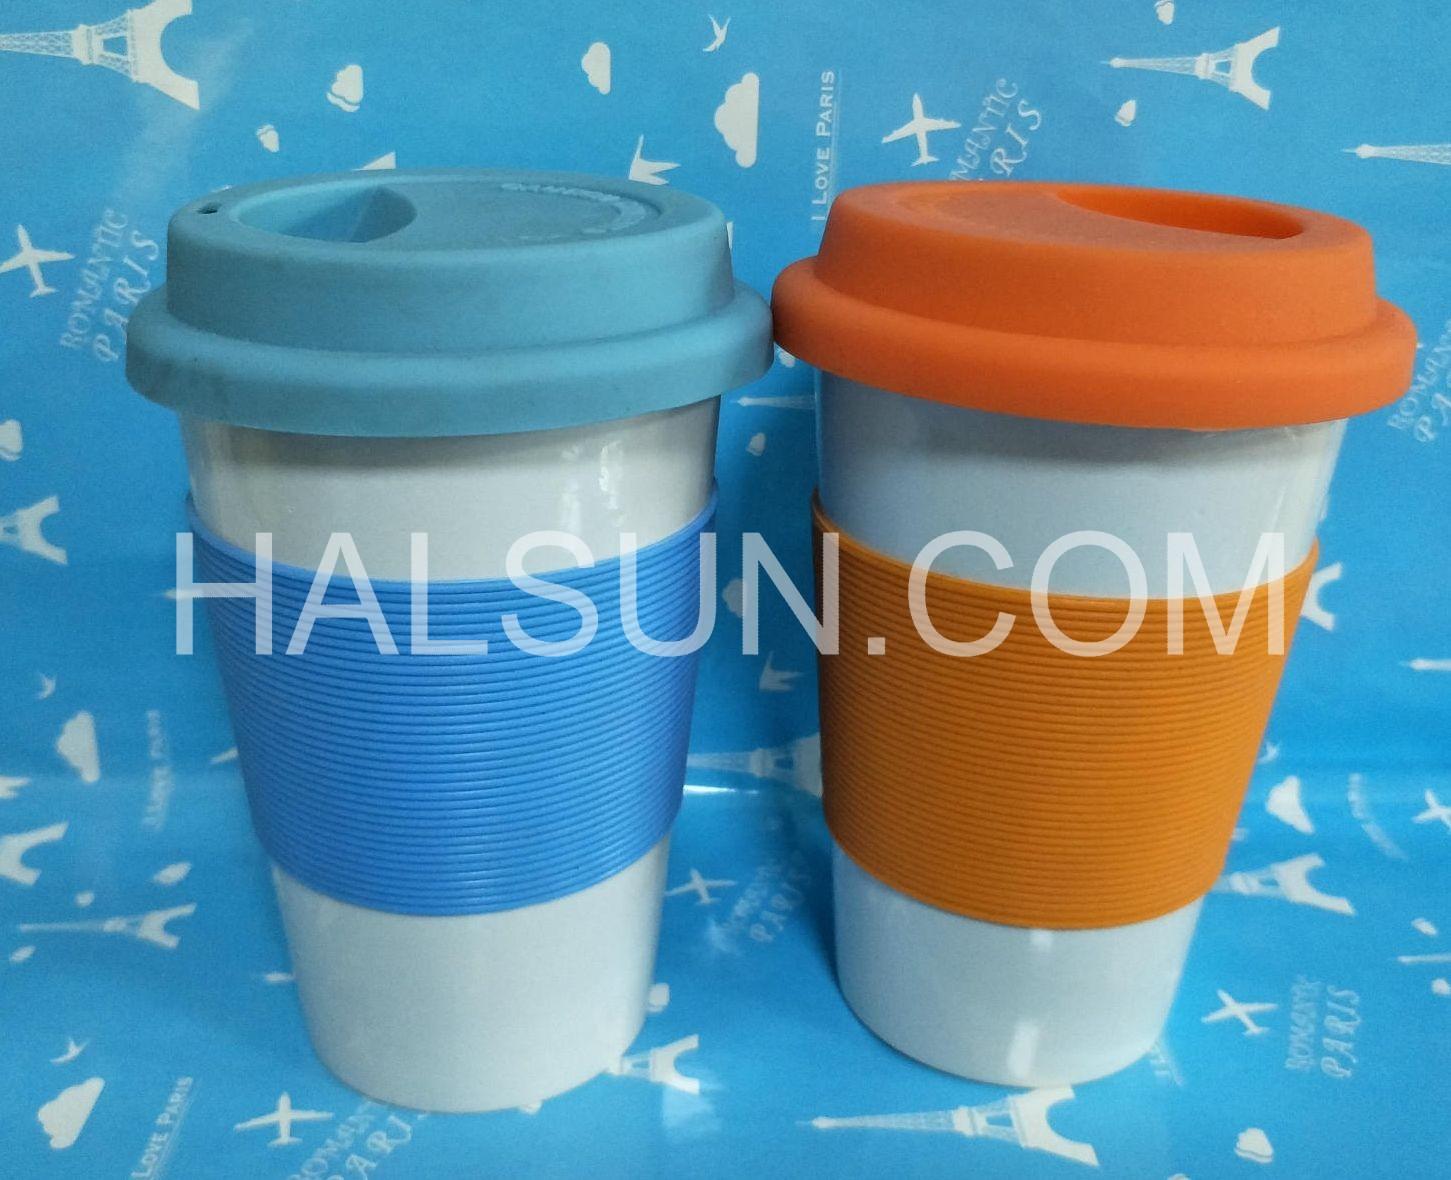 handy-coffee-mug.jpg